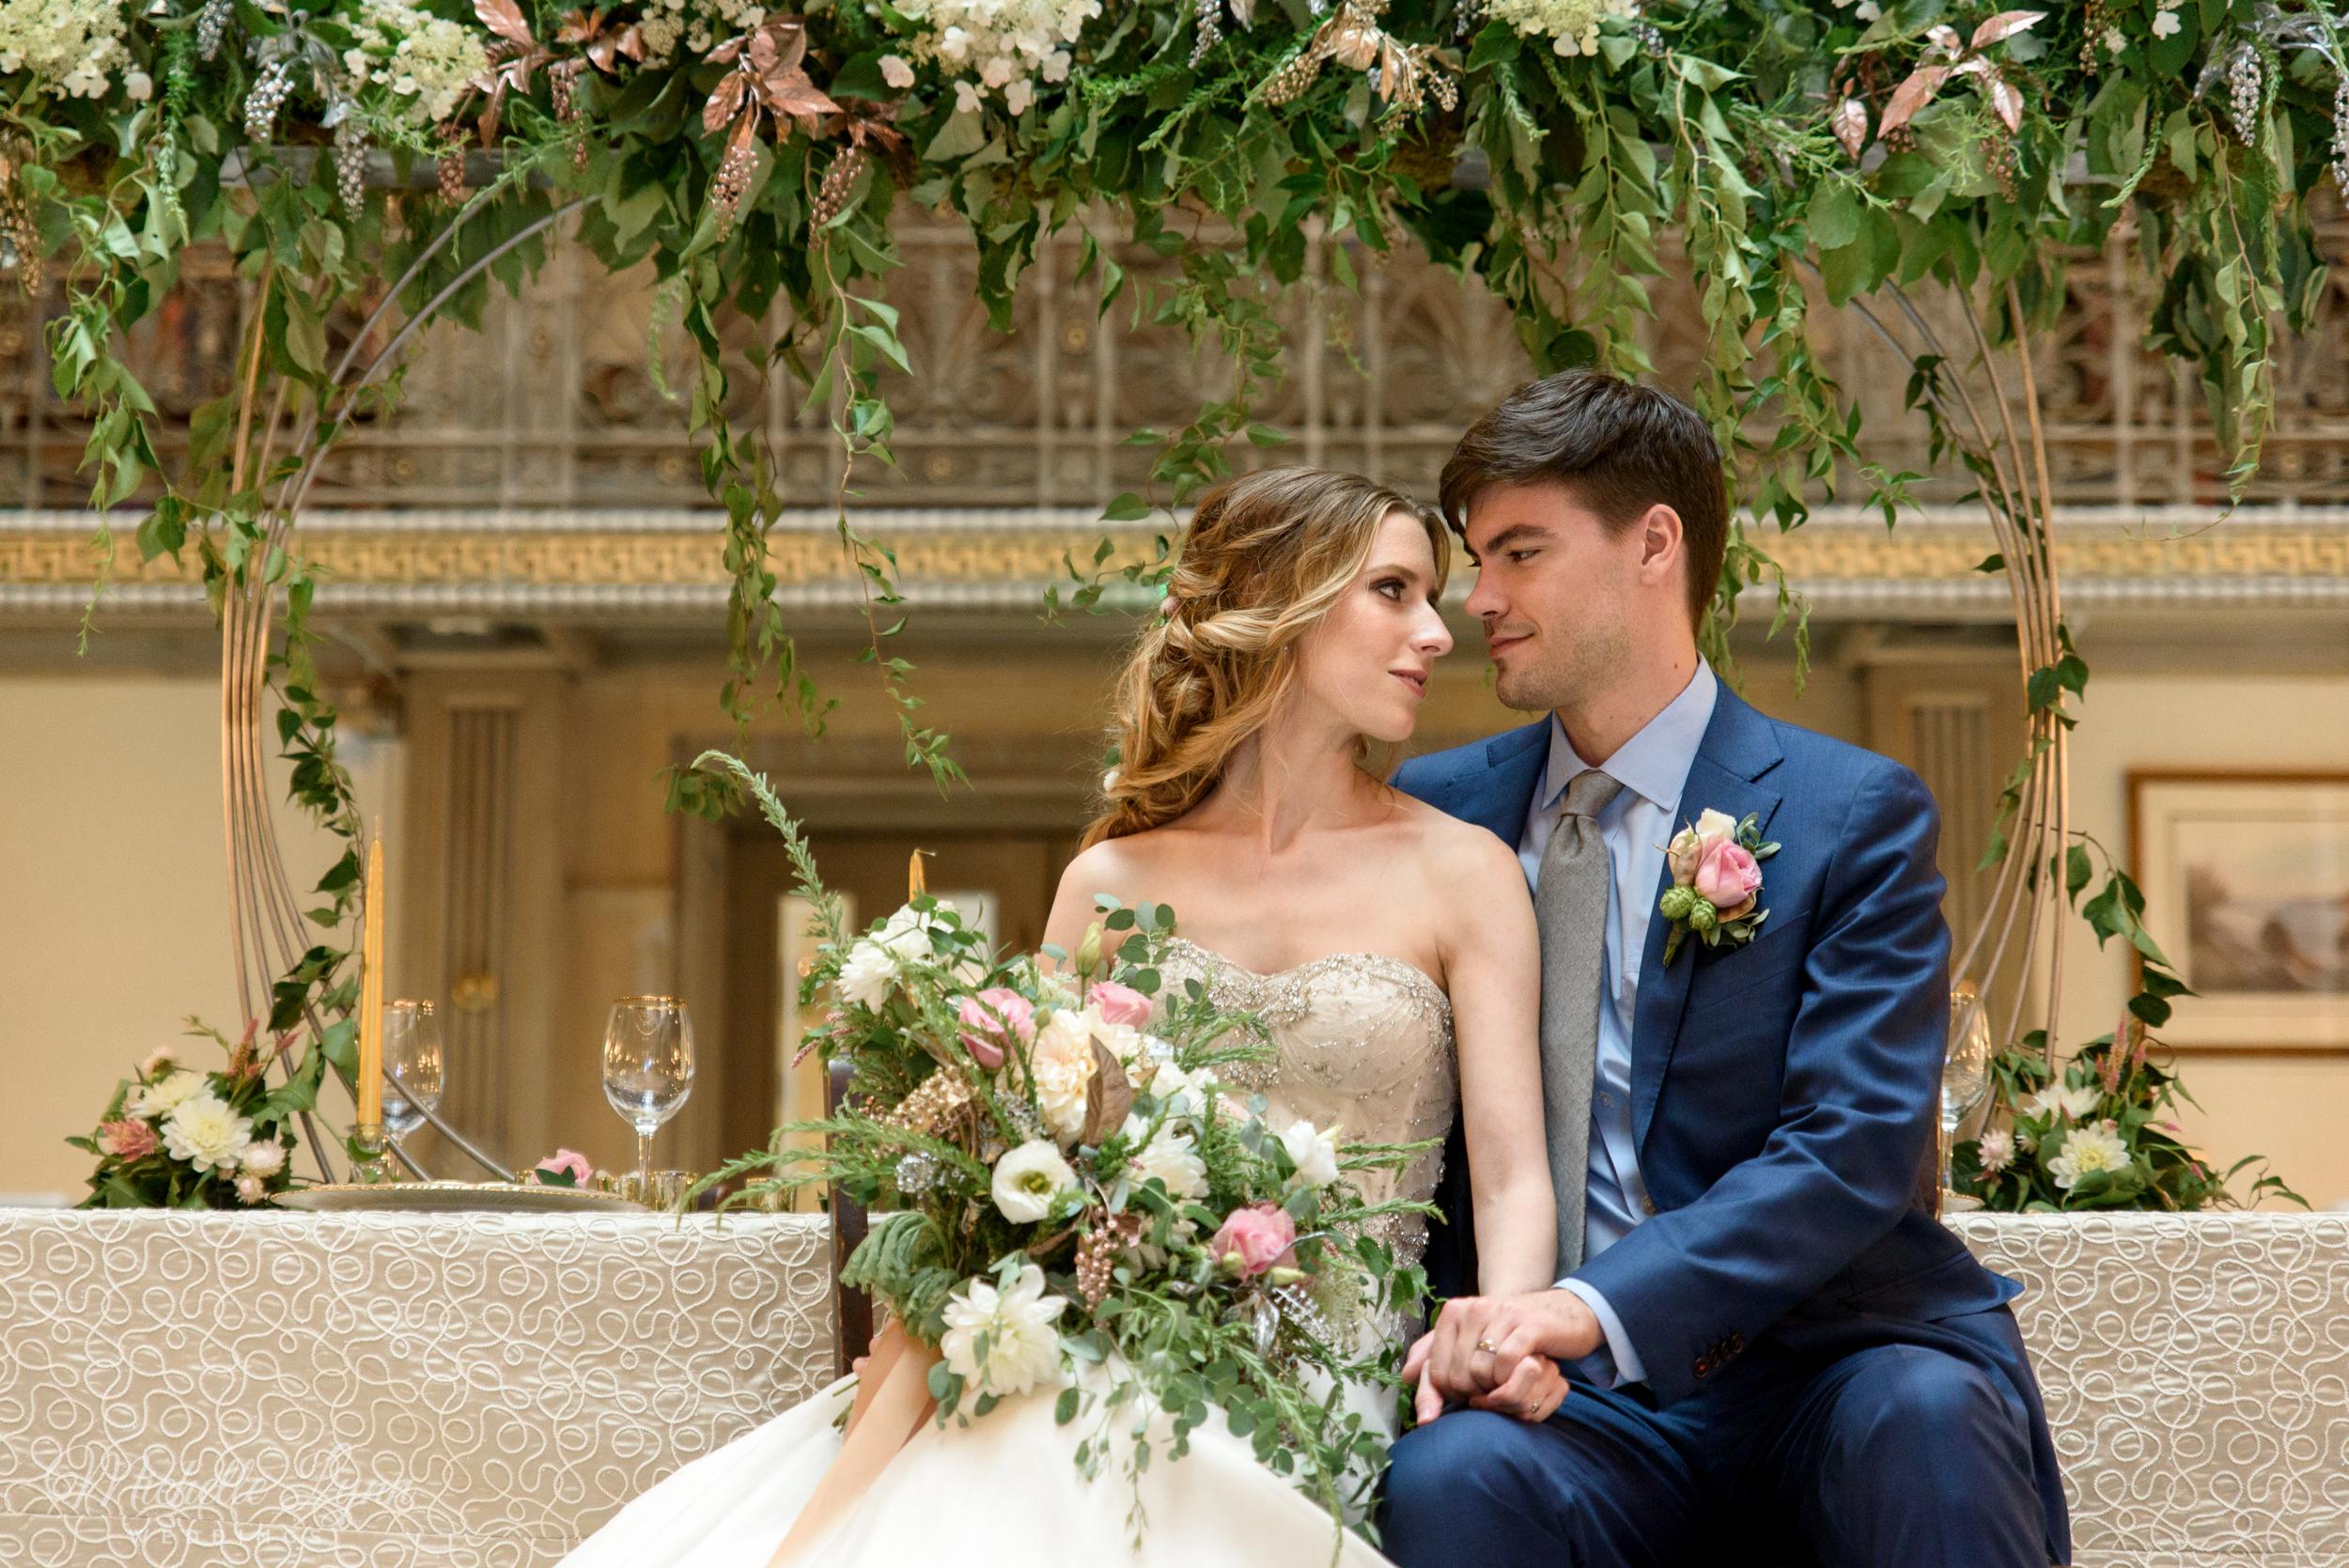 George_Peabody_Library-Wedding_Styled_Shoot-38.jpg